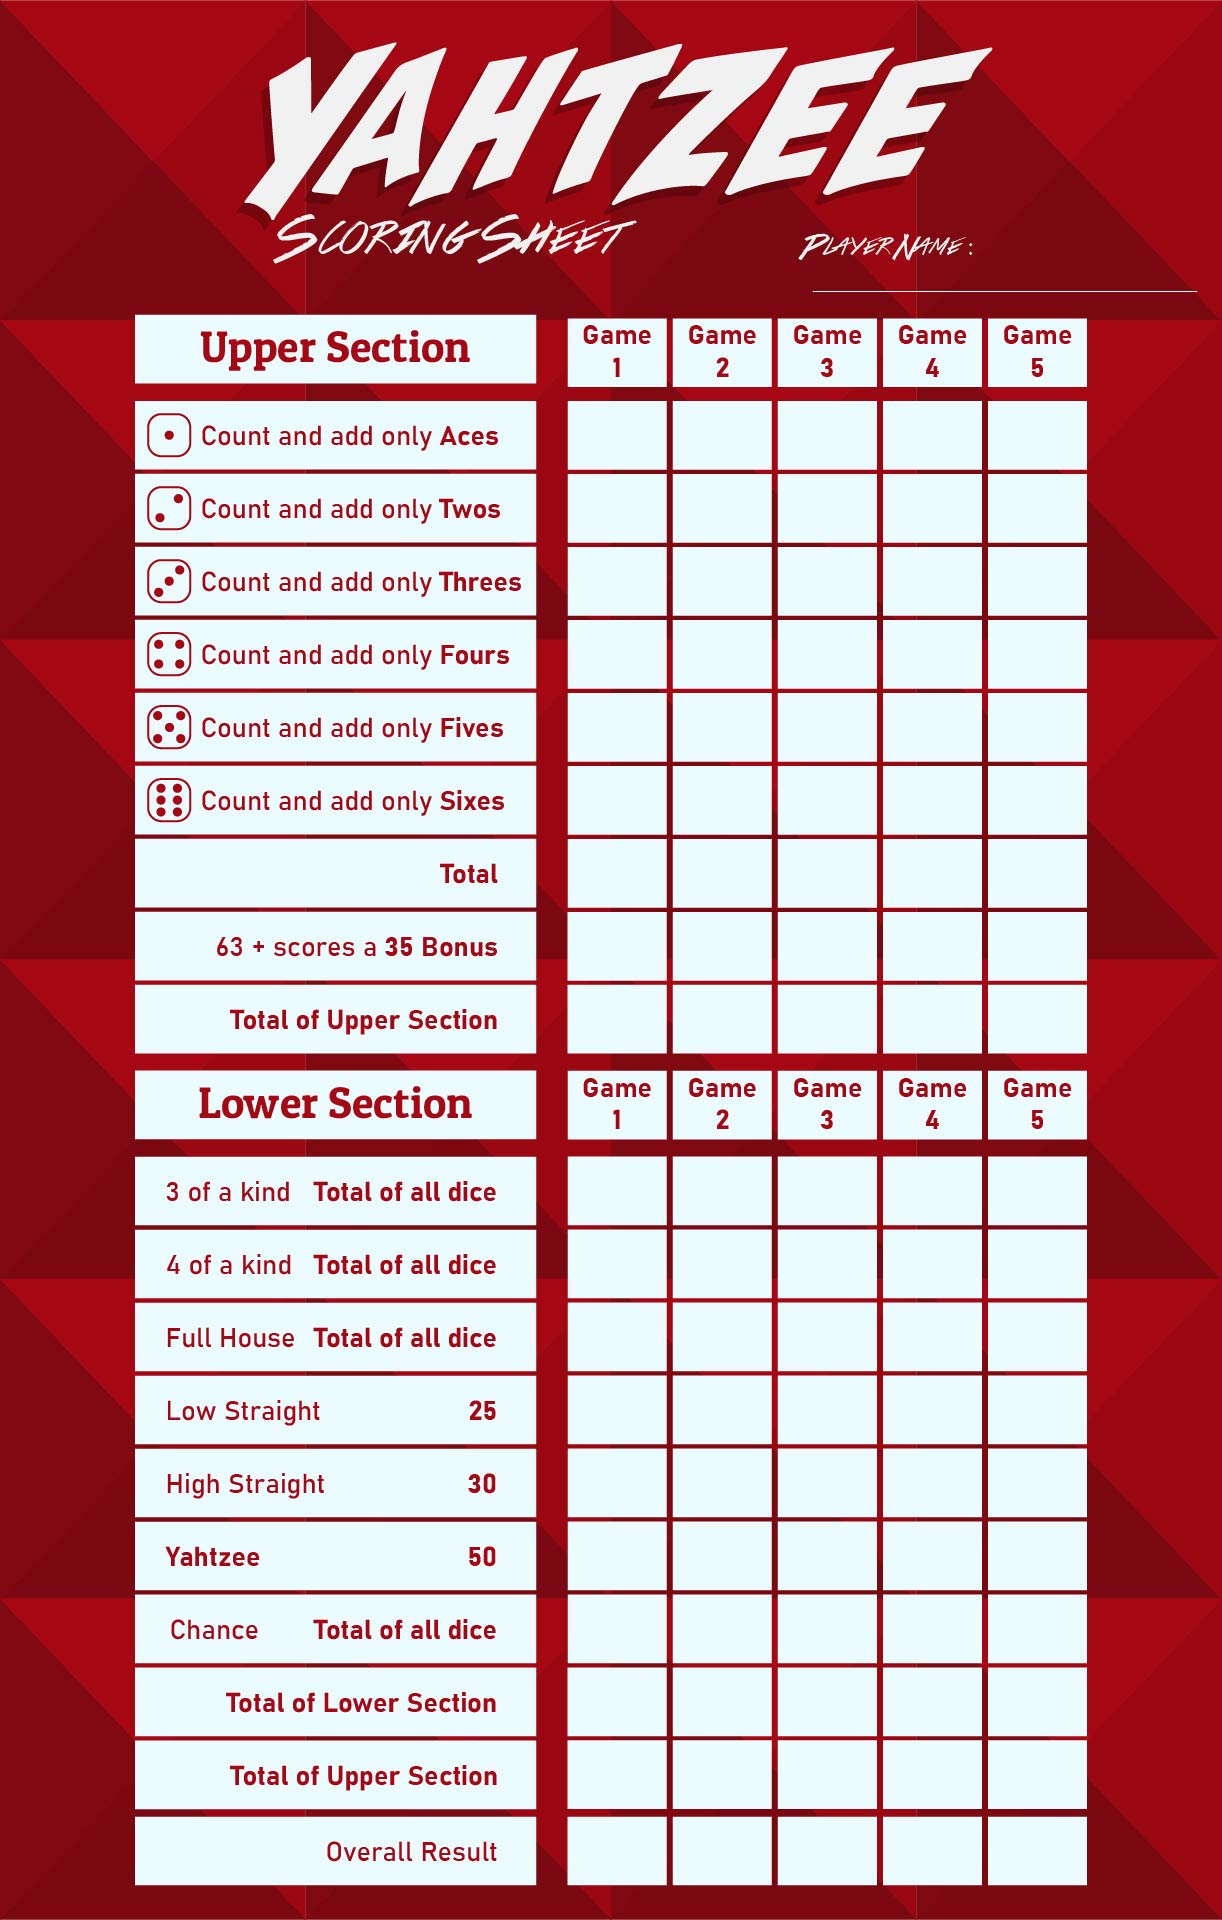 Yahtzee Score Sheet.pdf